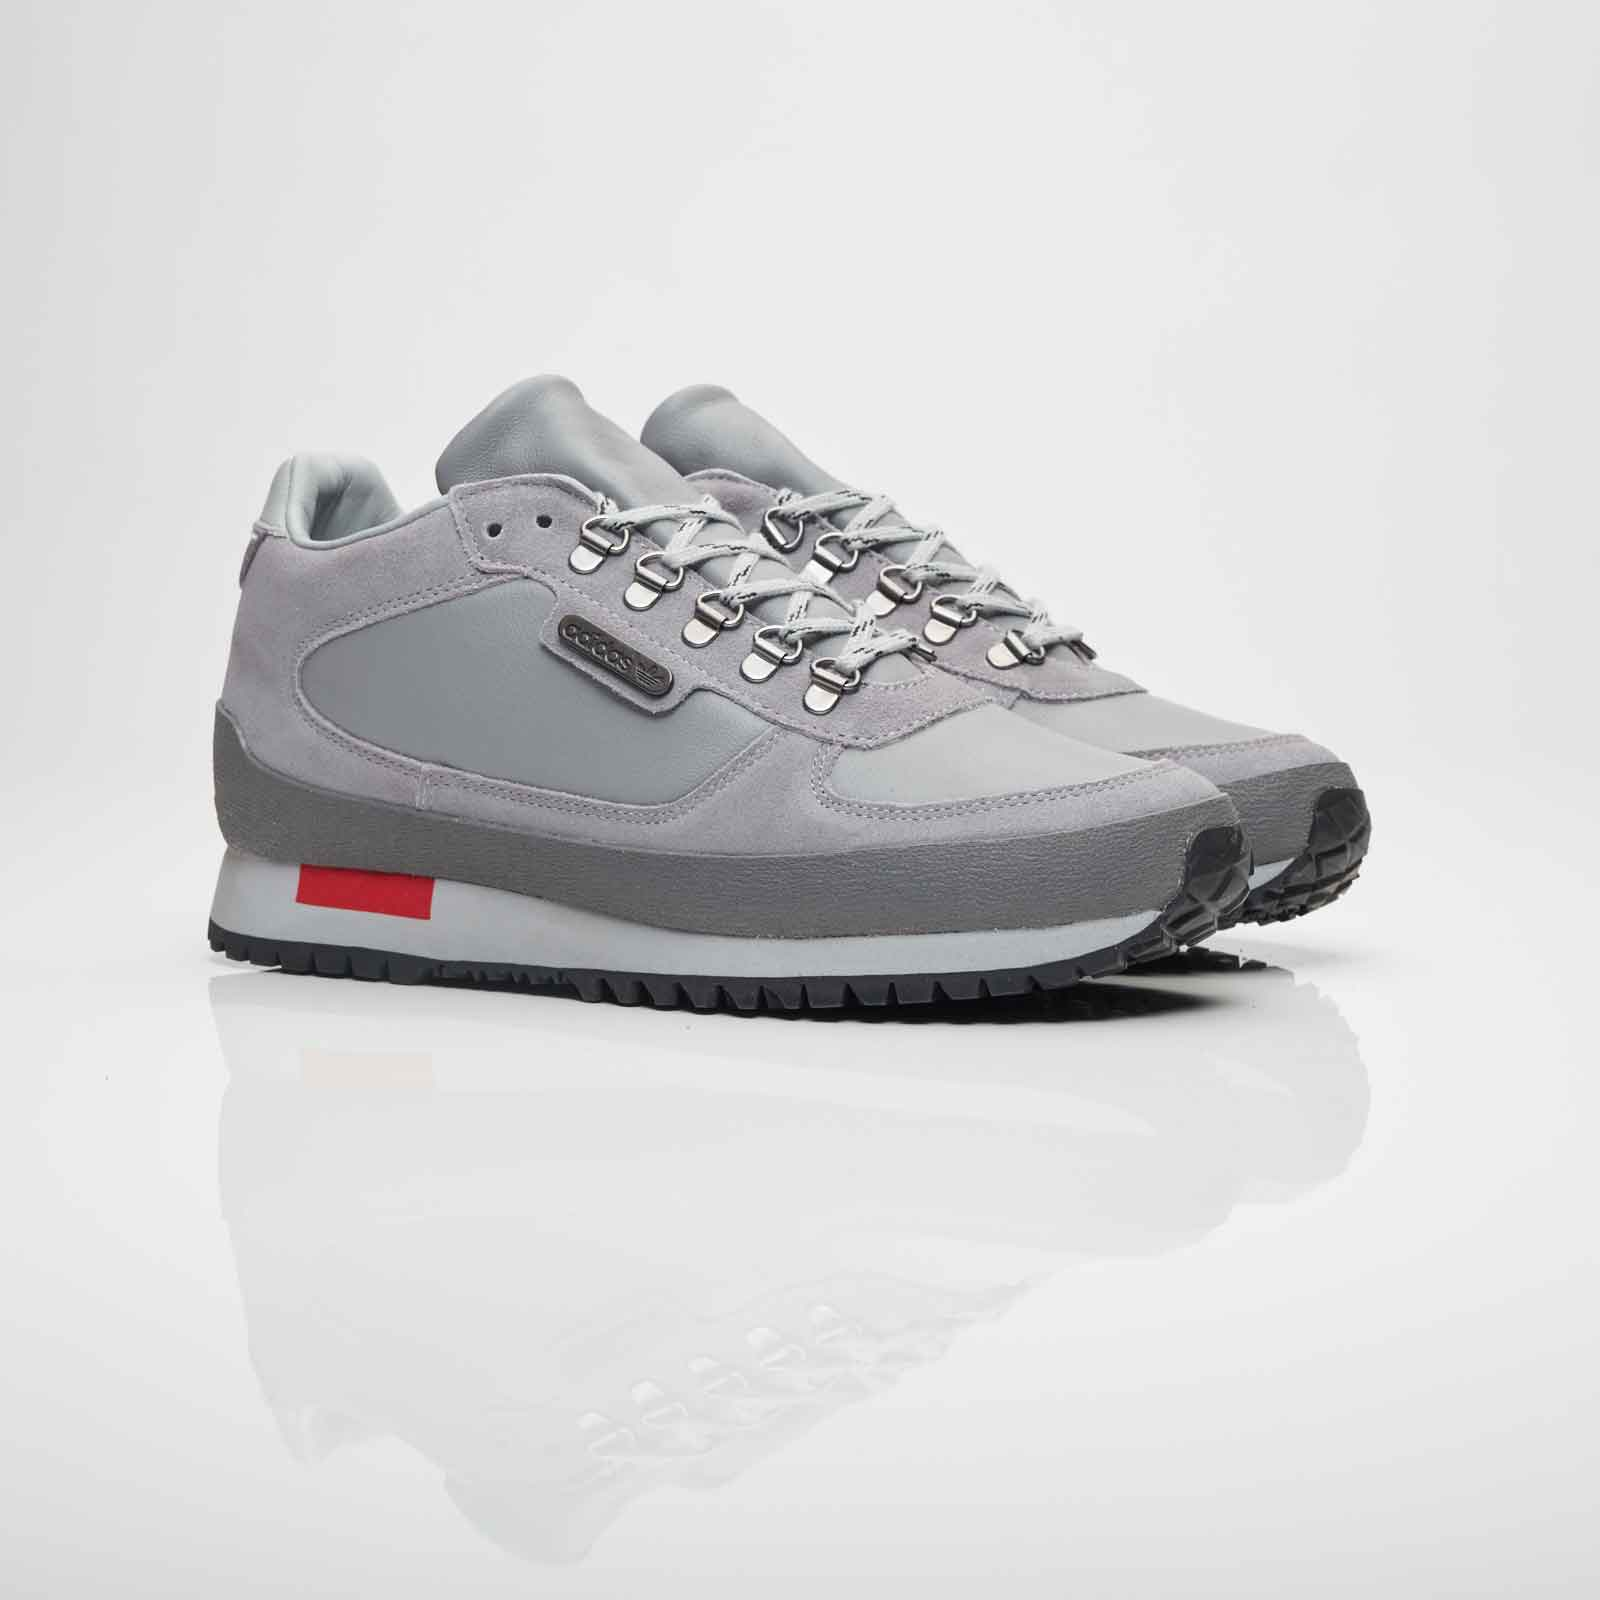 adidas Winterhill SPEZIAL - Cg2927